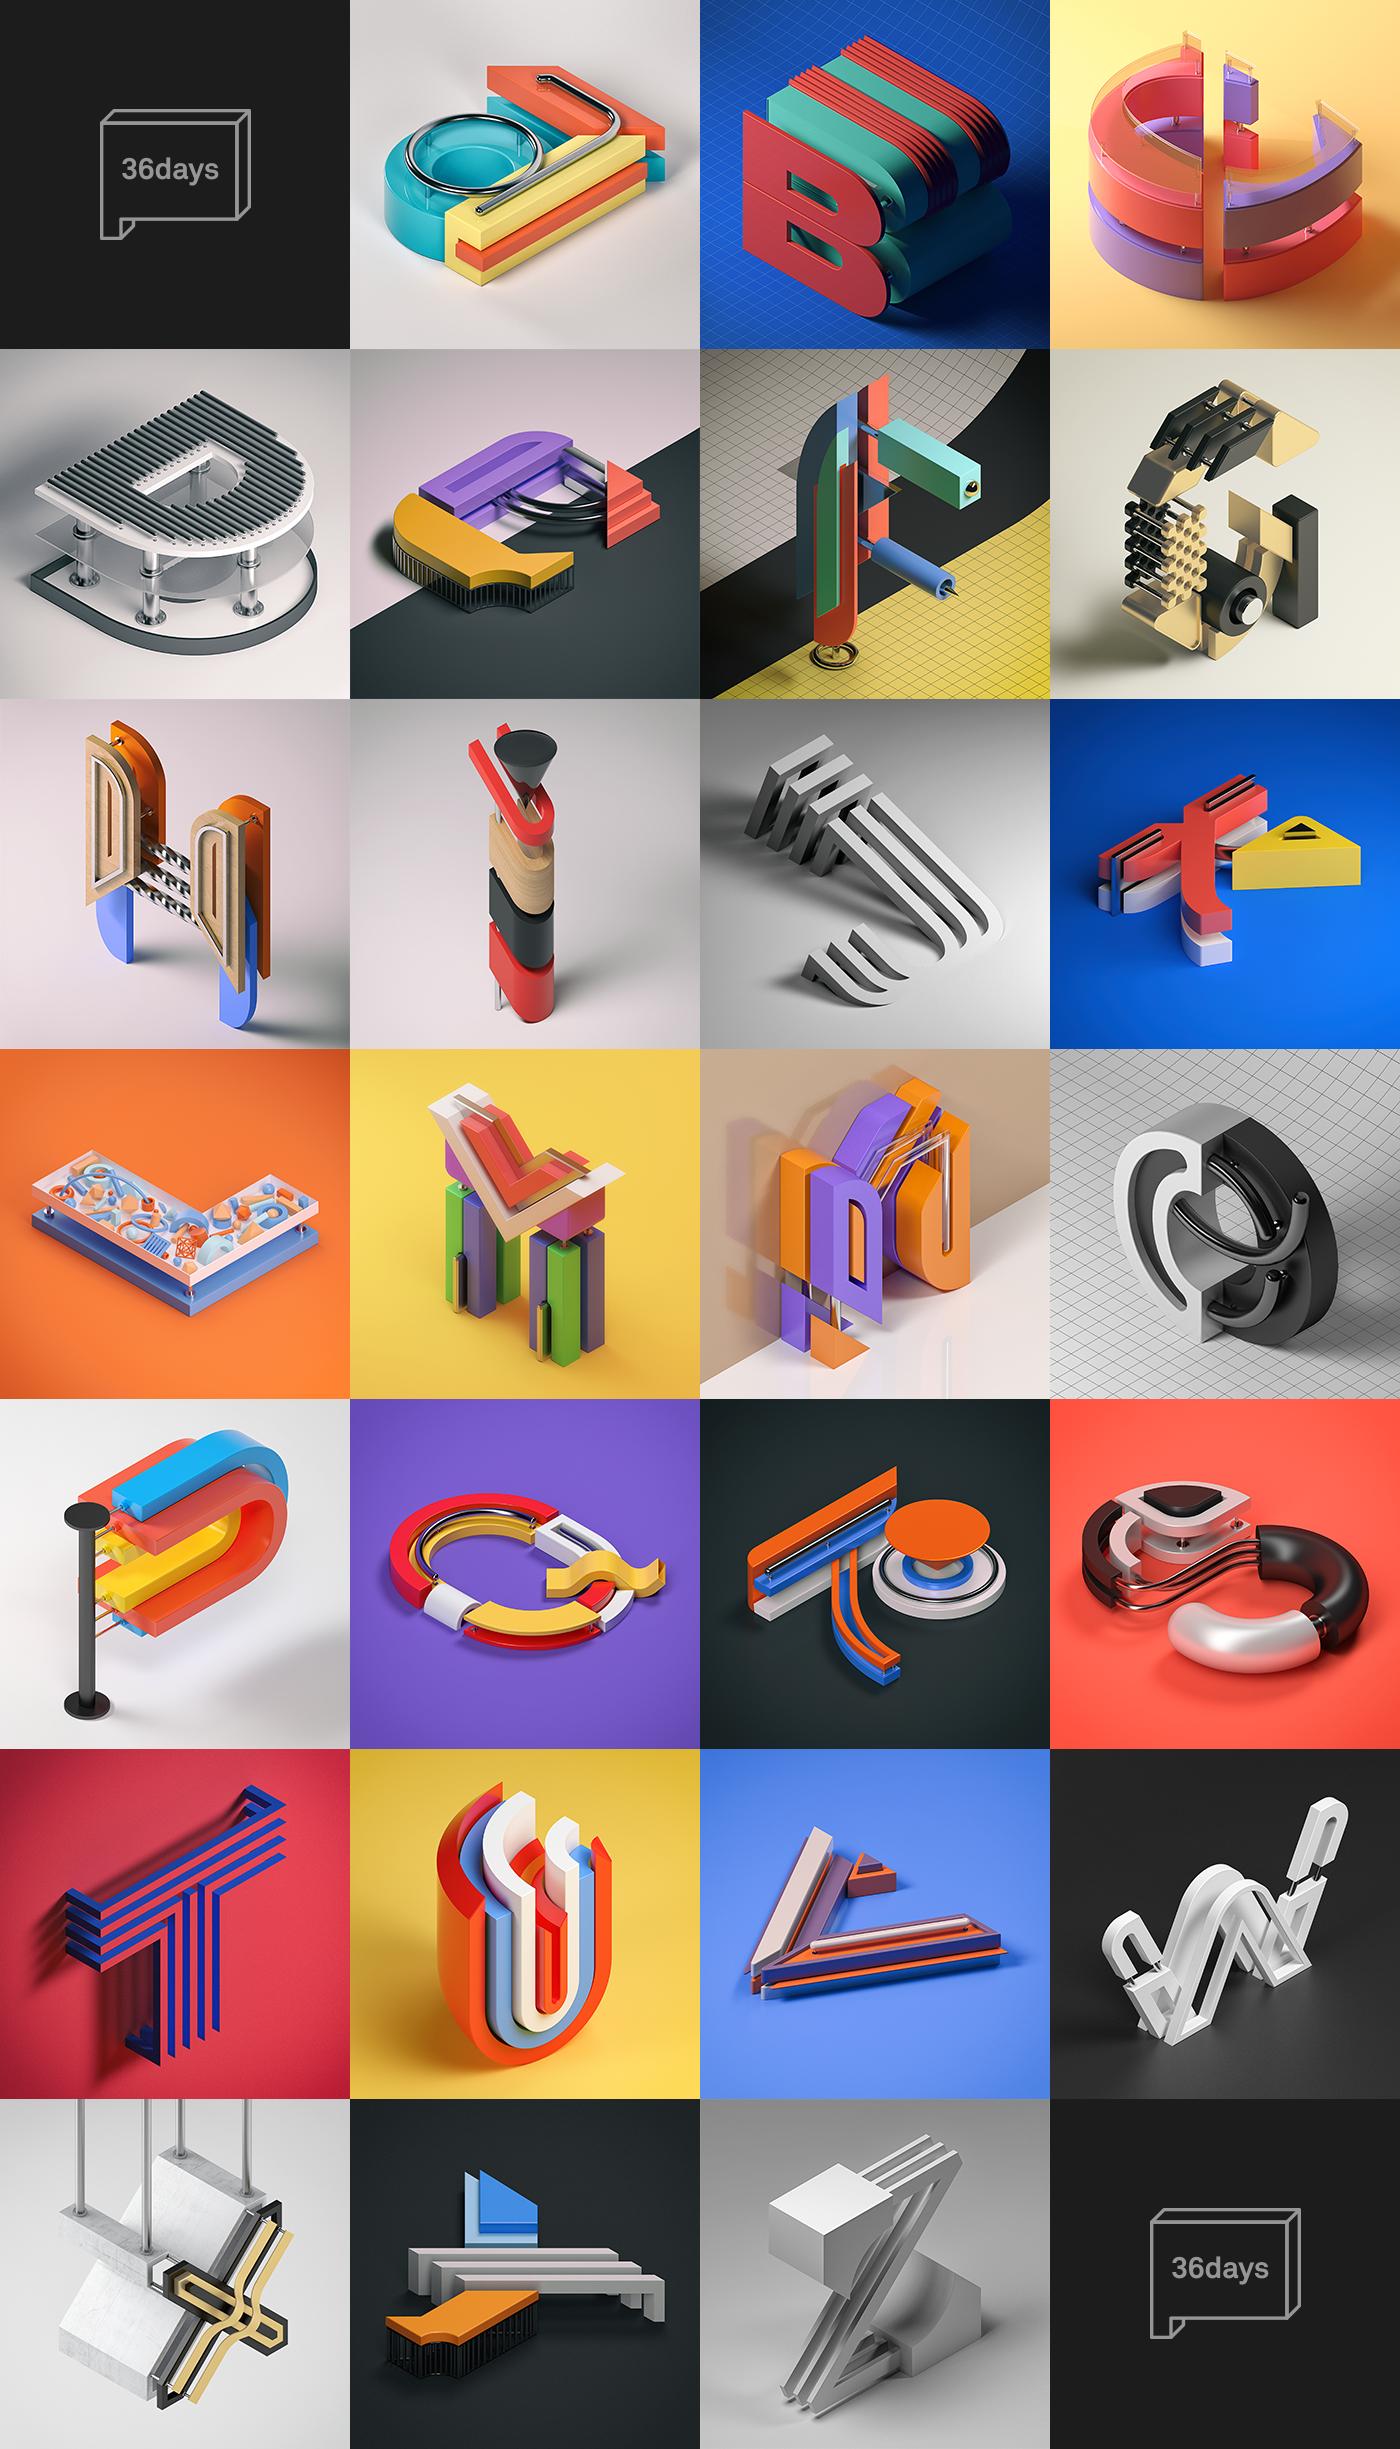 Adobe Portfolio,36days,36daysoftype,CGI,3D,type,geometric,colour,alphabet,letters,experimental,Ps25Under25,c4d,photoshop,cinema 4d,inspire